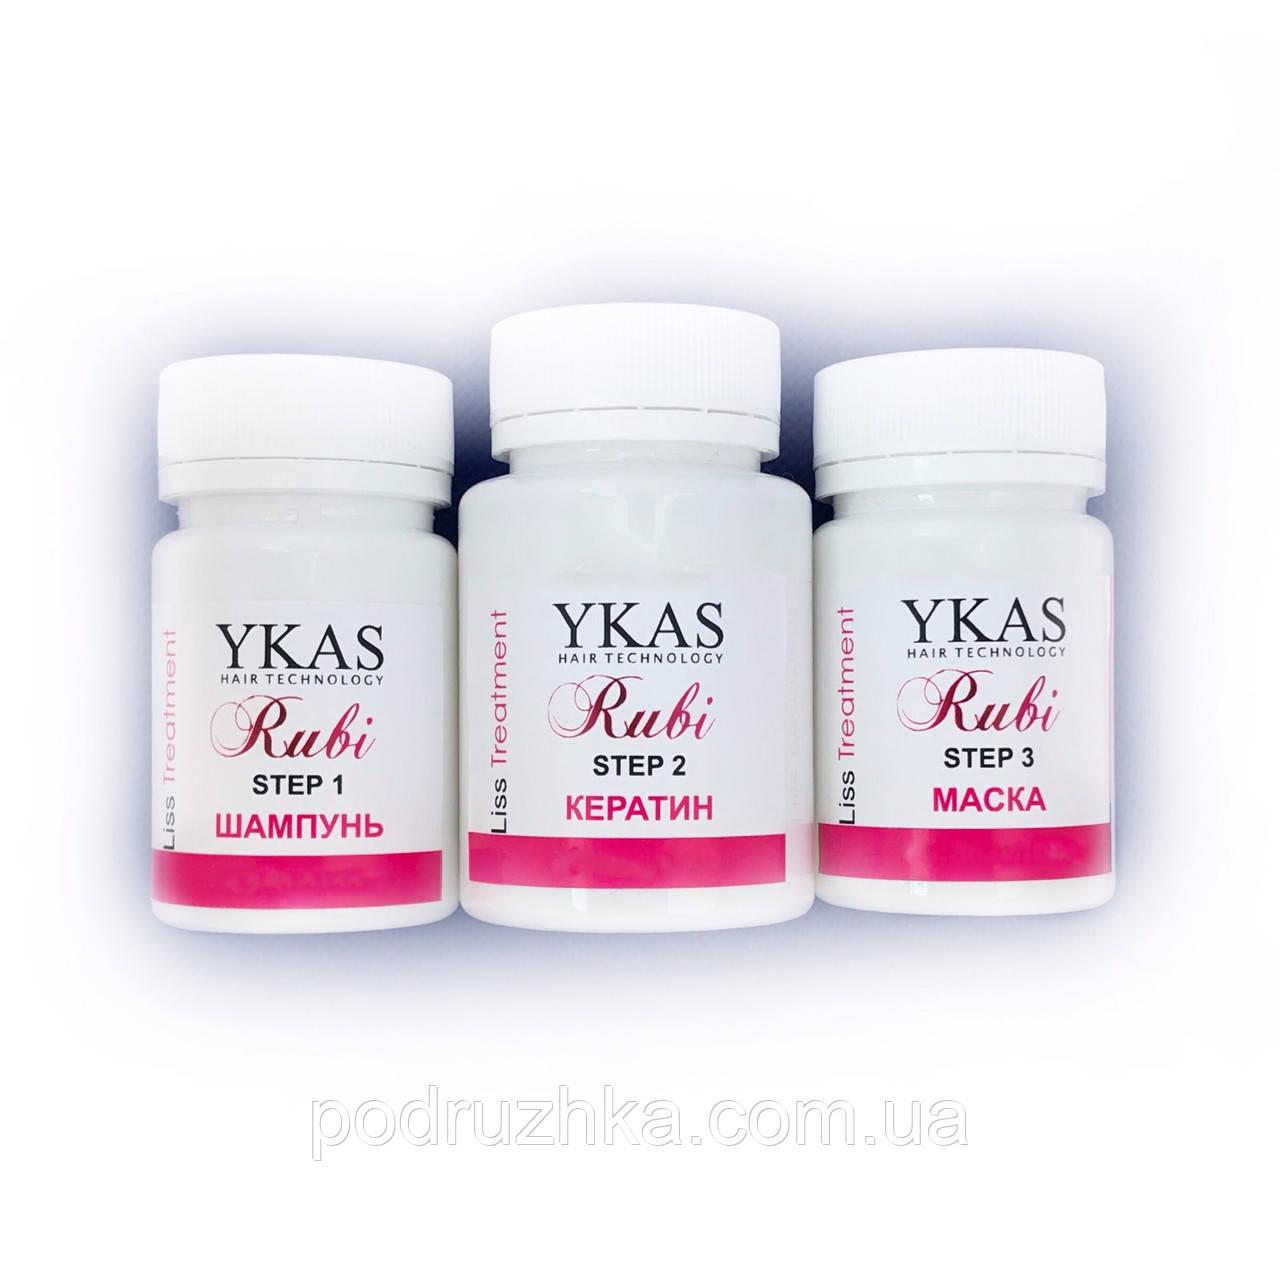 YKAS Rubi Набор кератина для волос 50/100/50 г (разлив)